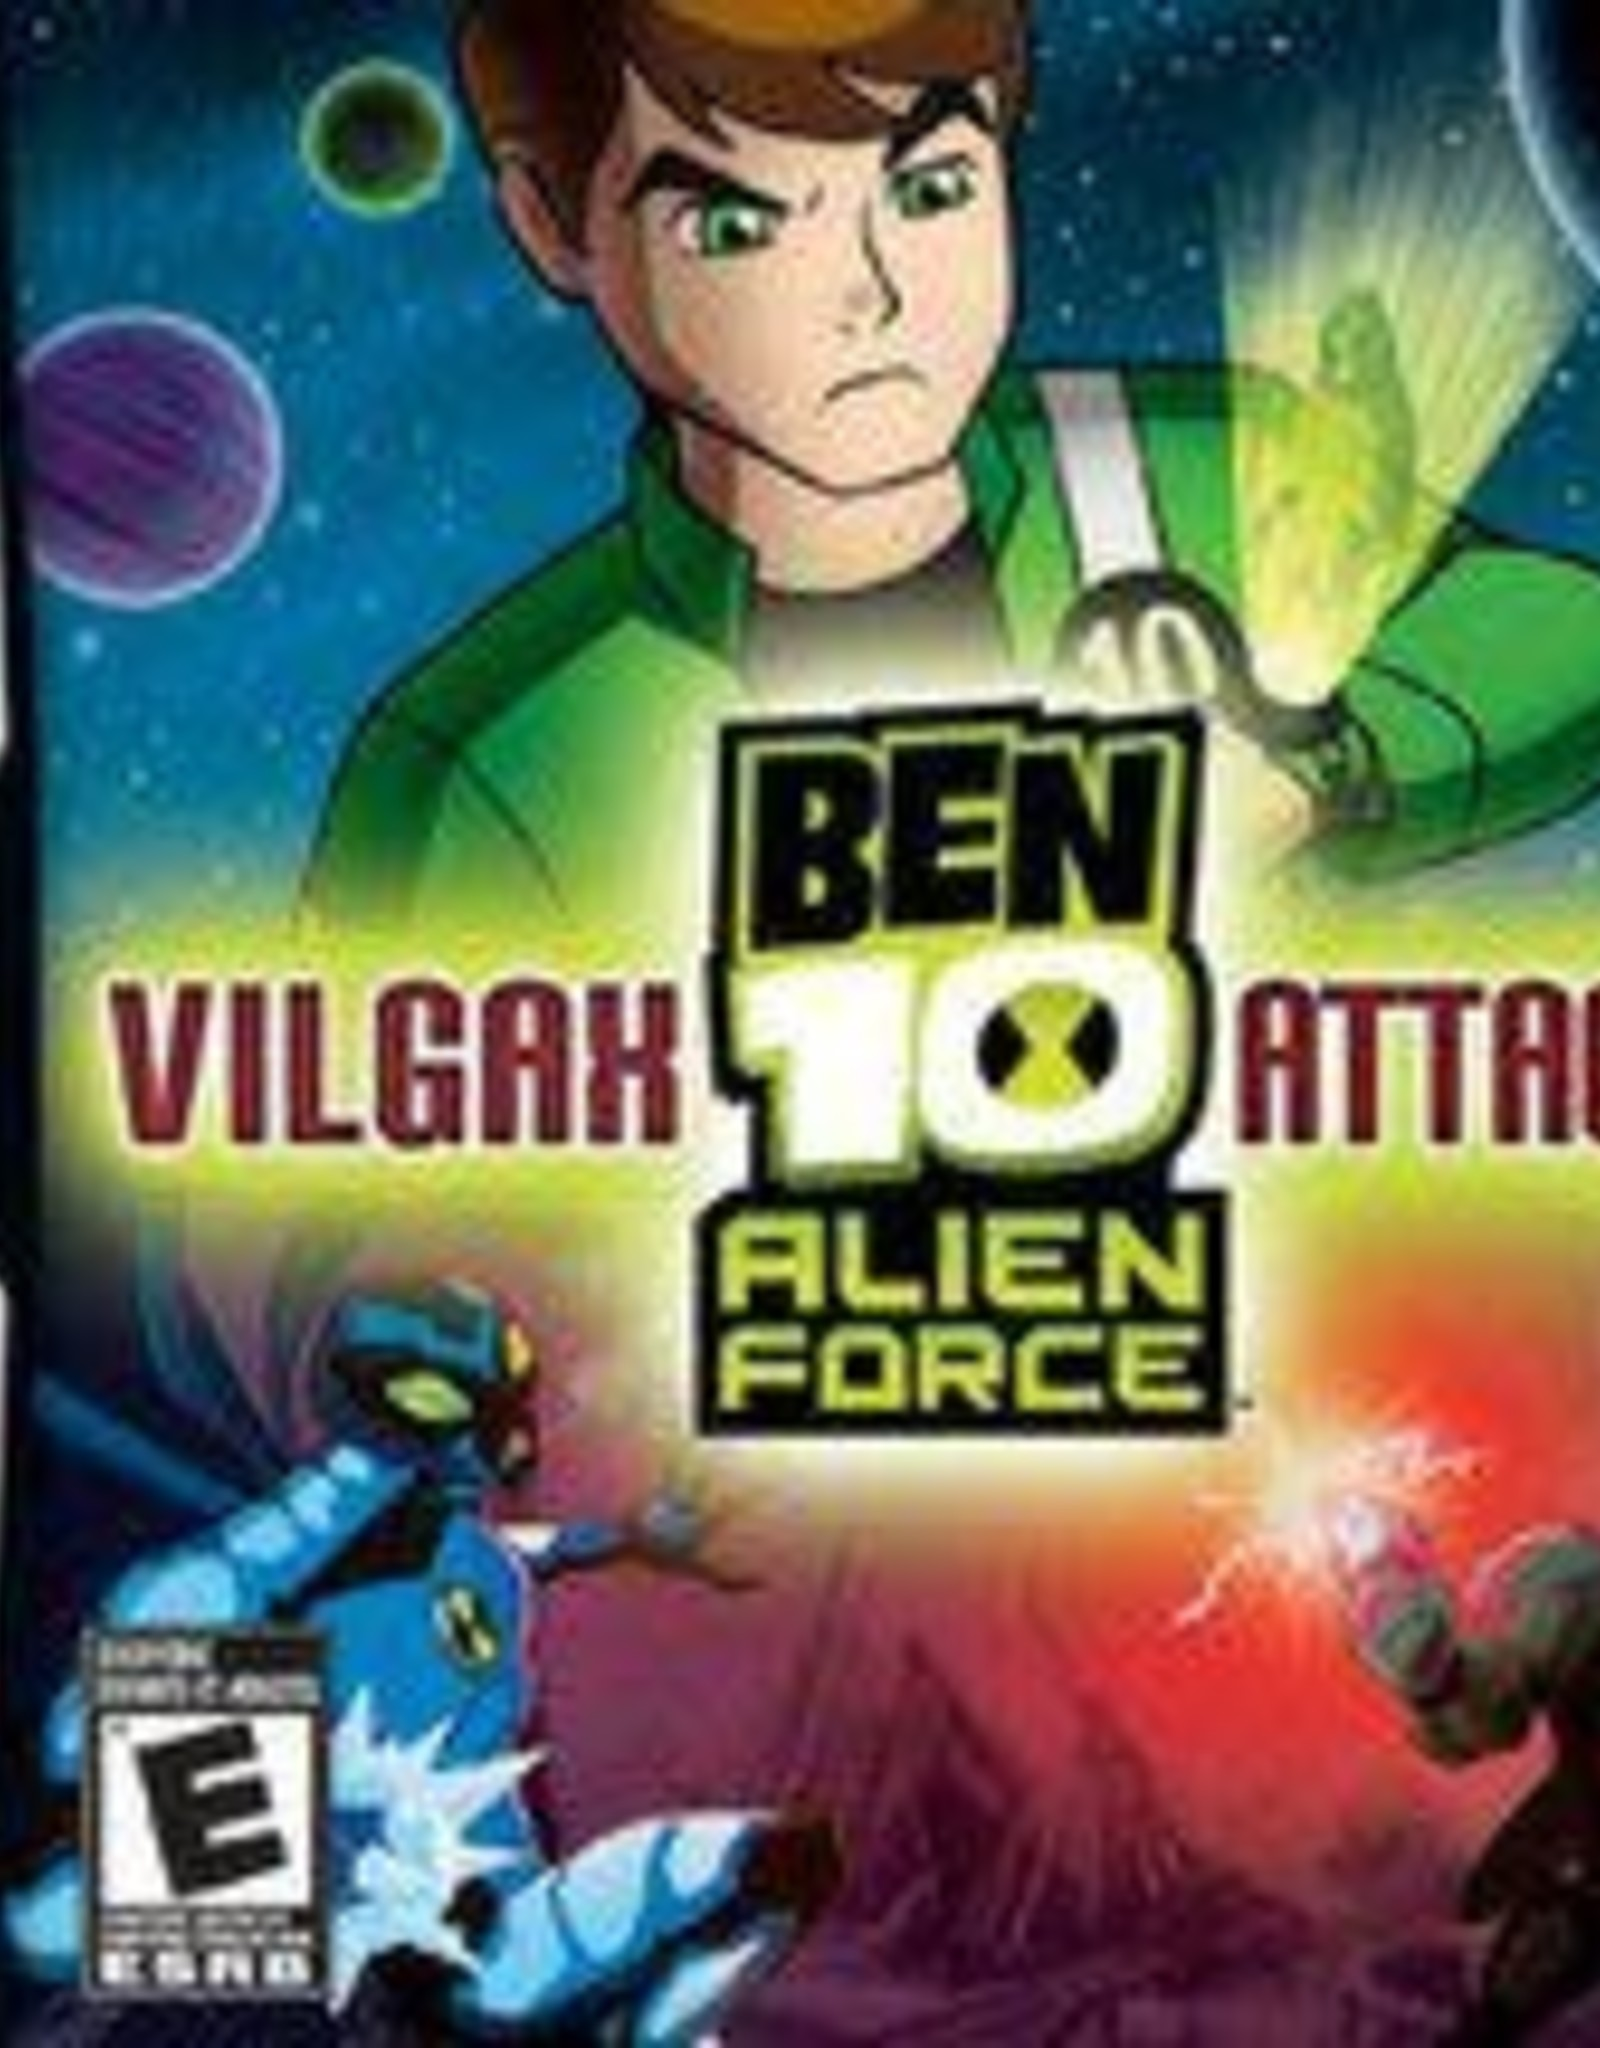 Nintendo DS Ben 10: Alien Force: Vilgax Attacks